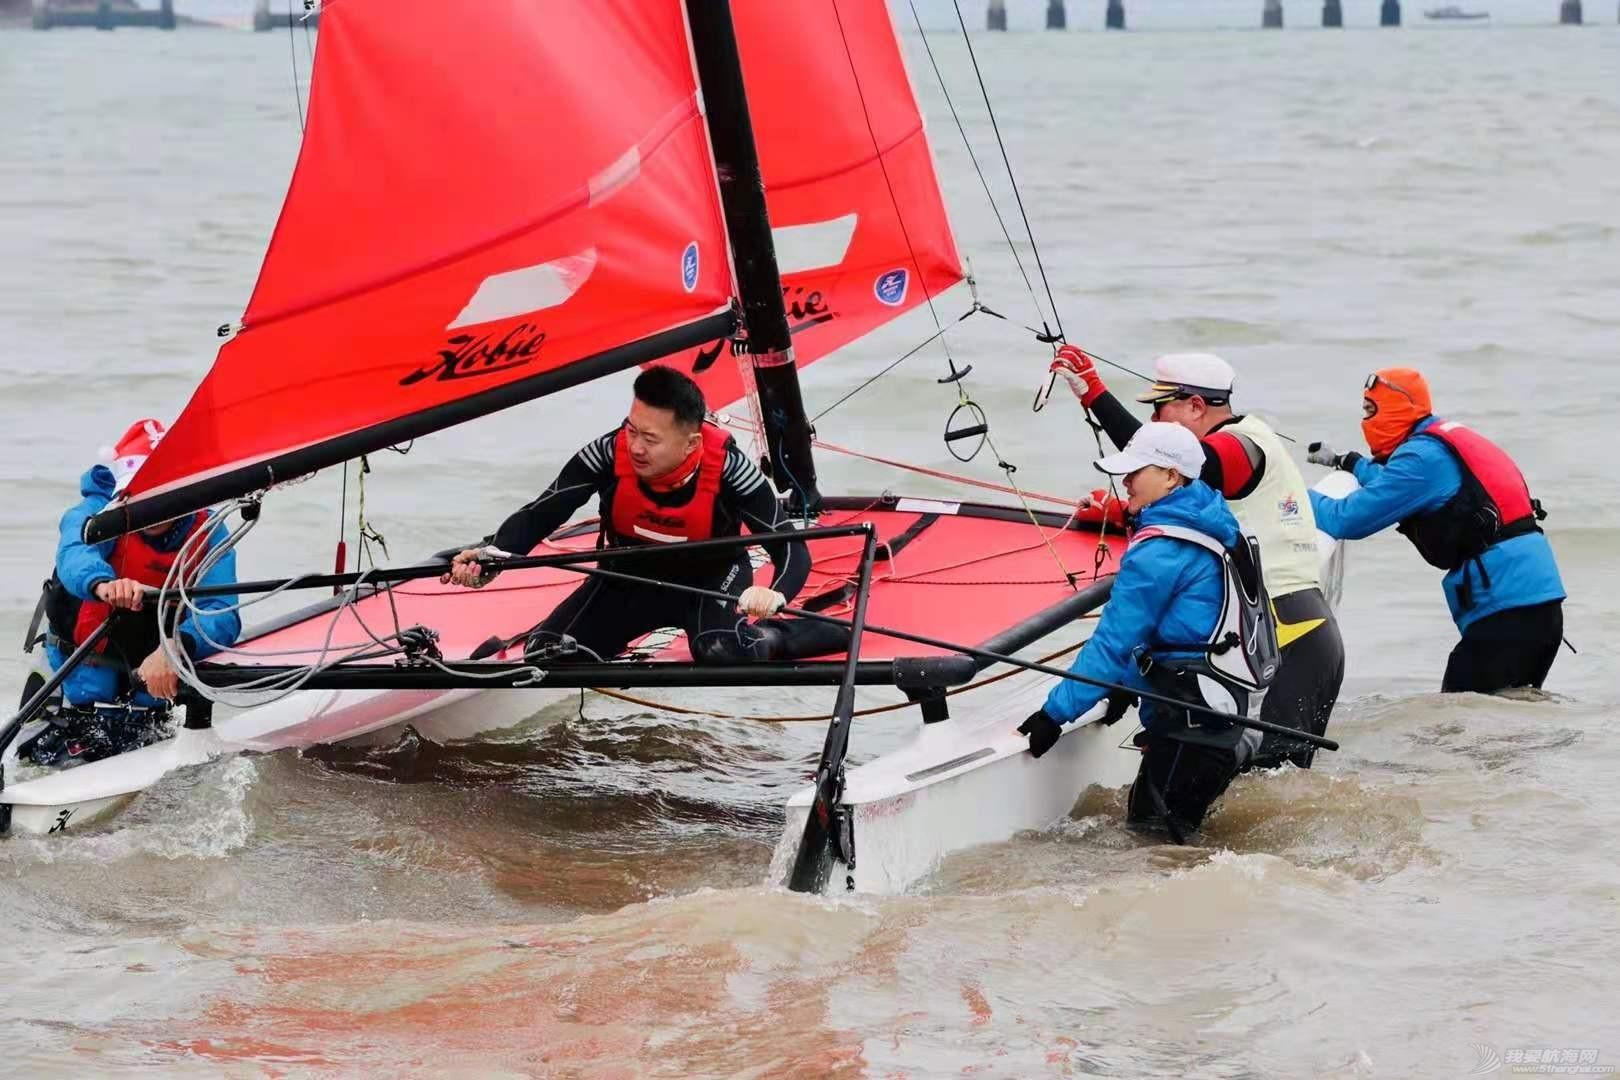 nbsp,广西,帆船,级别,岭南 你若喜欢海  我会一直浪  ——2020北部湾国际帆船公开赛Hobie级别回顾  111041hm35fy0gzczx0gg1